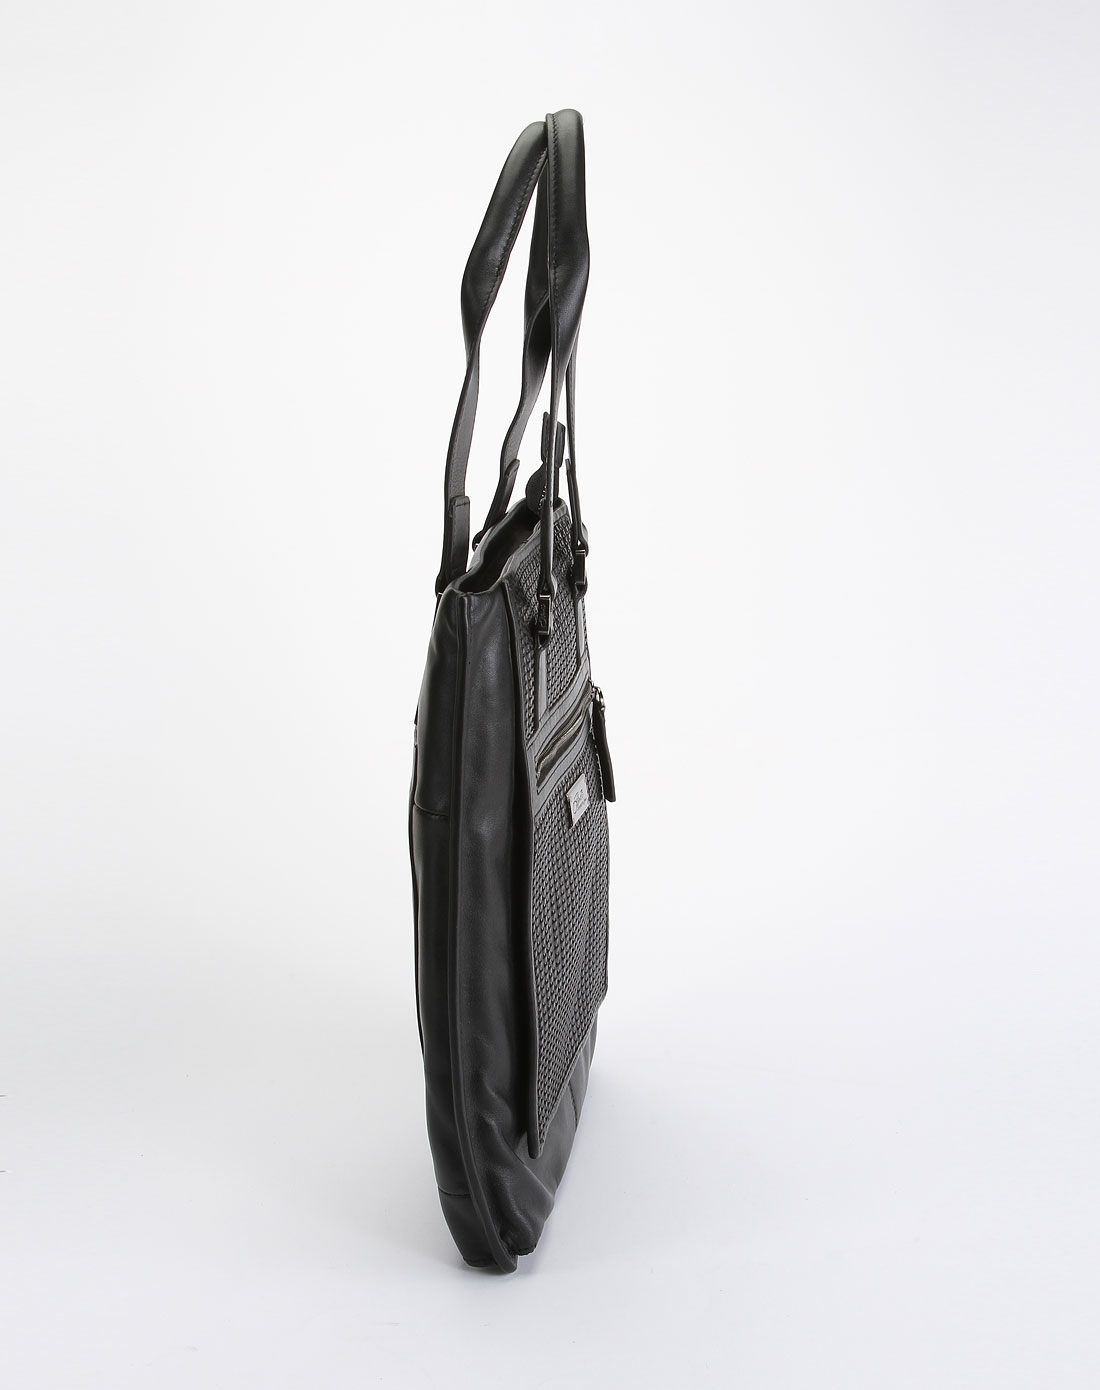 benato男款黑色时尚休闲手提包b3590403b